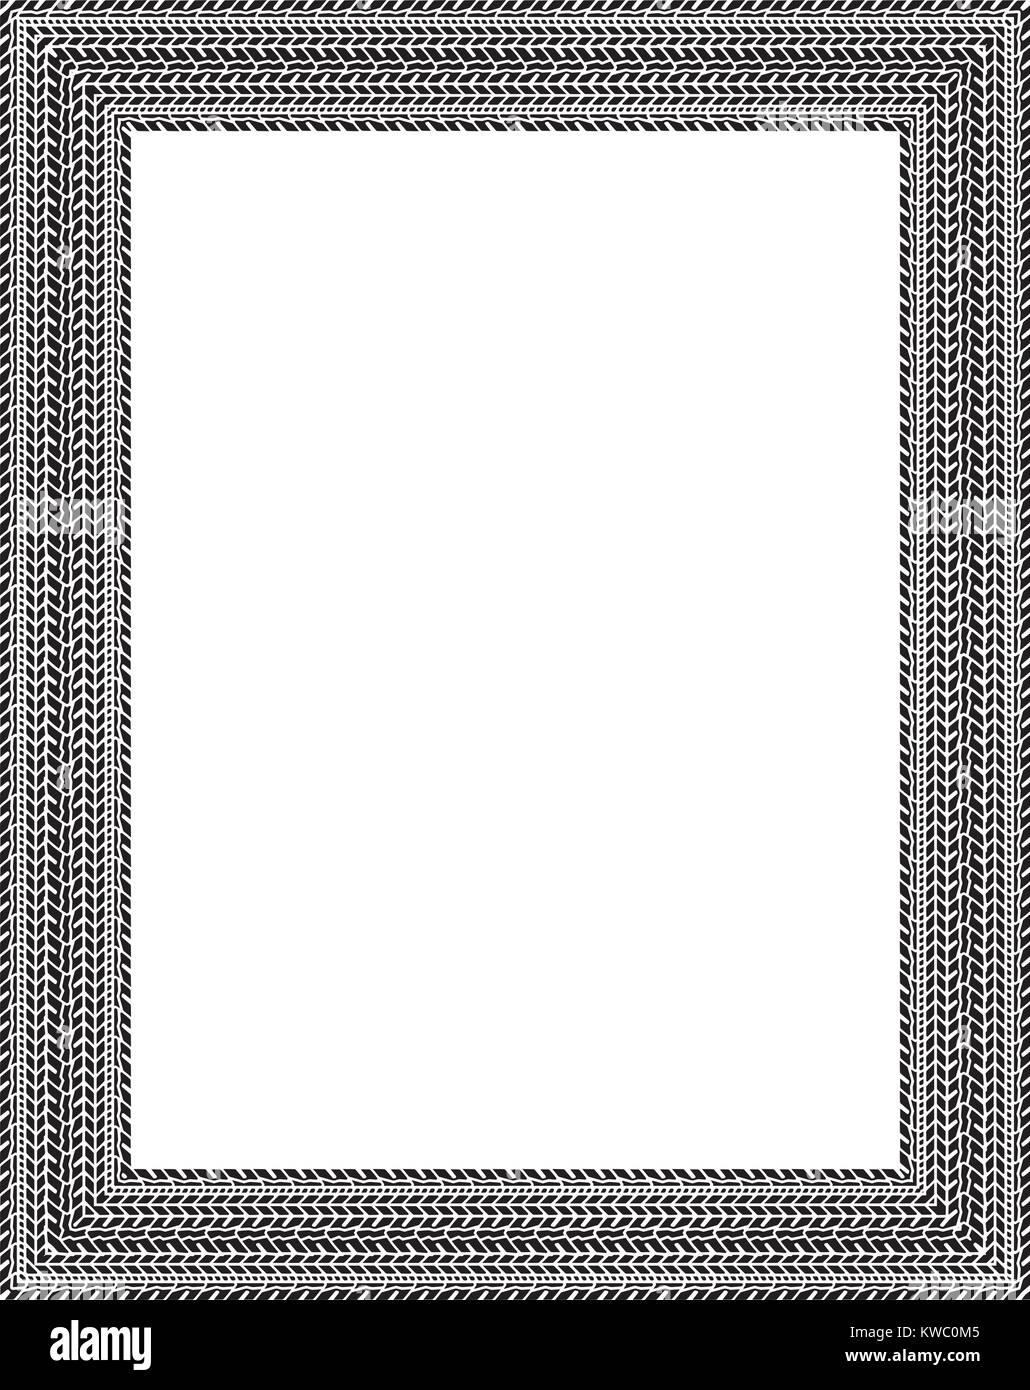 Vektor Rahmen in reifen Spuren Stil Vektor Abbildung - Bild ...